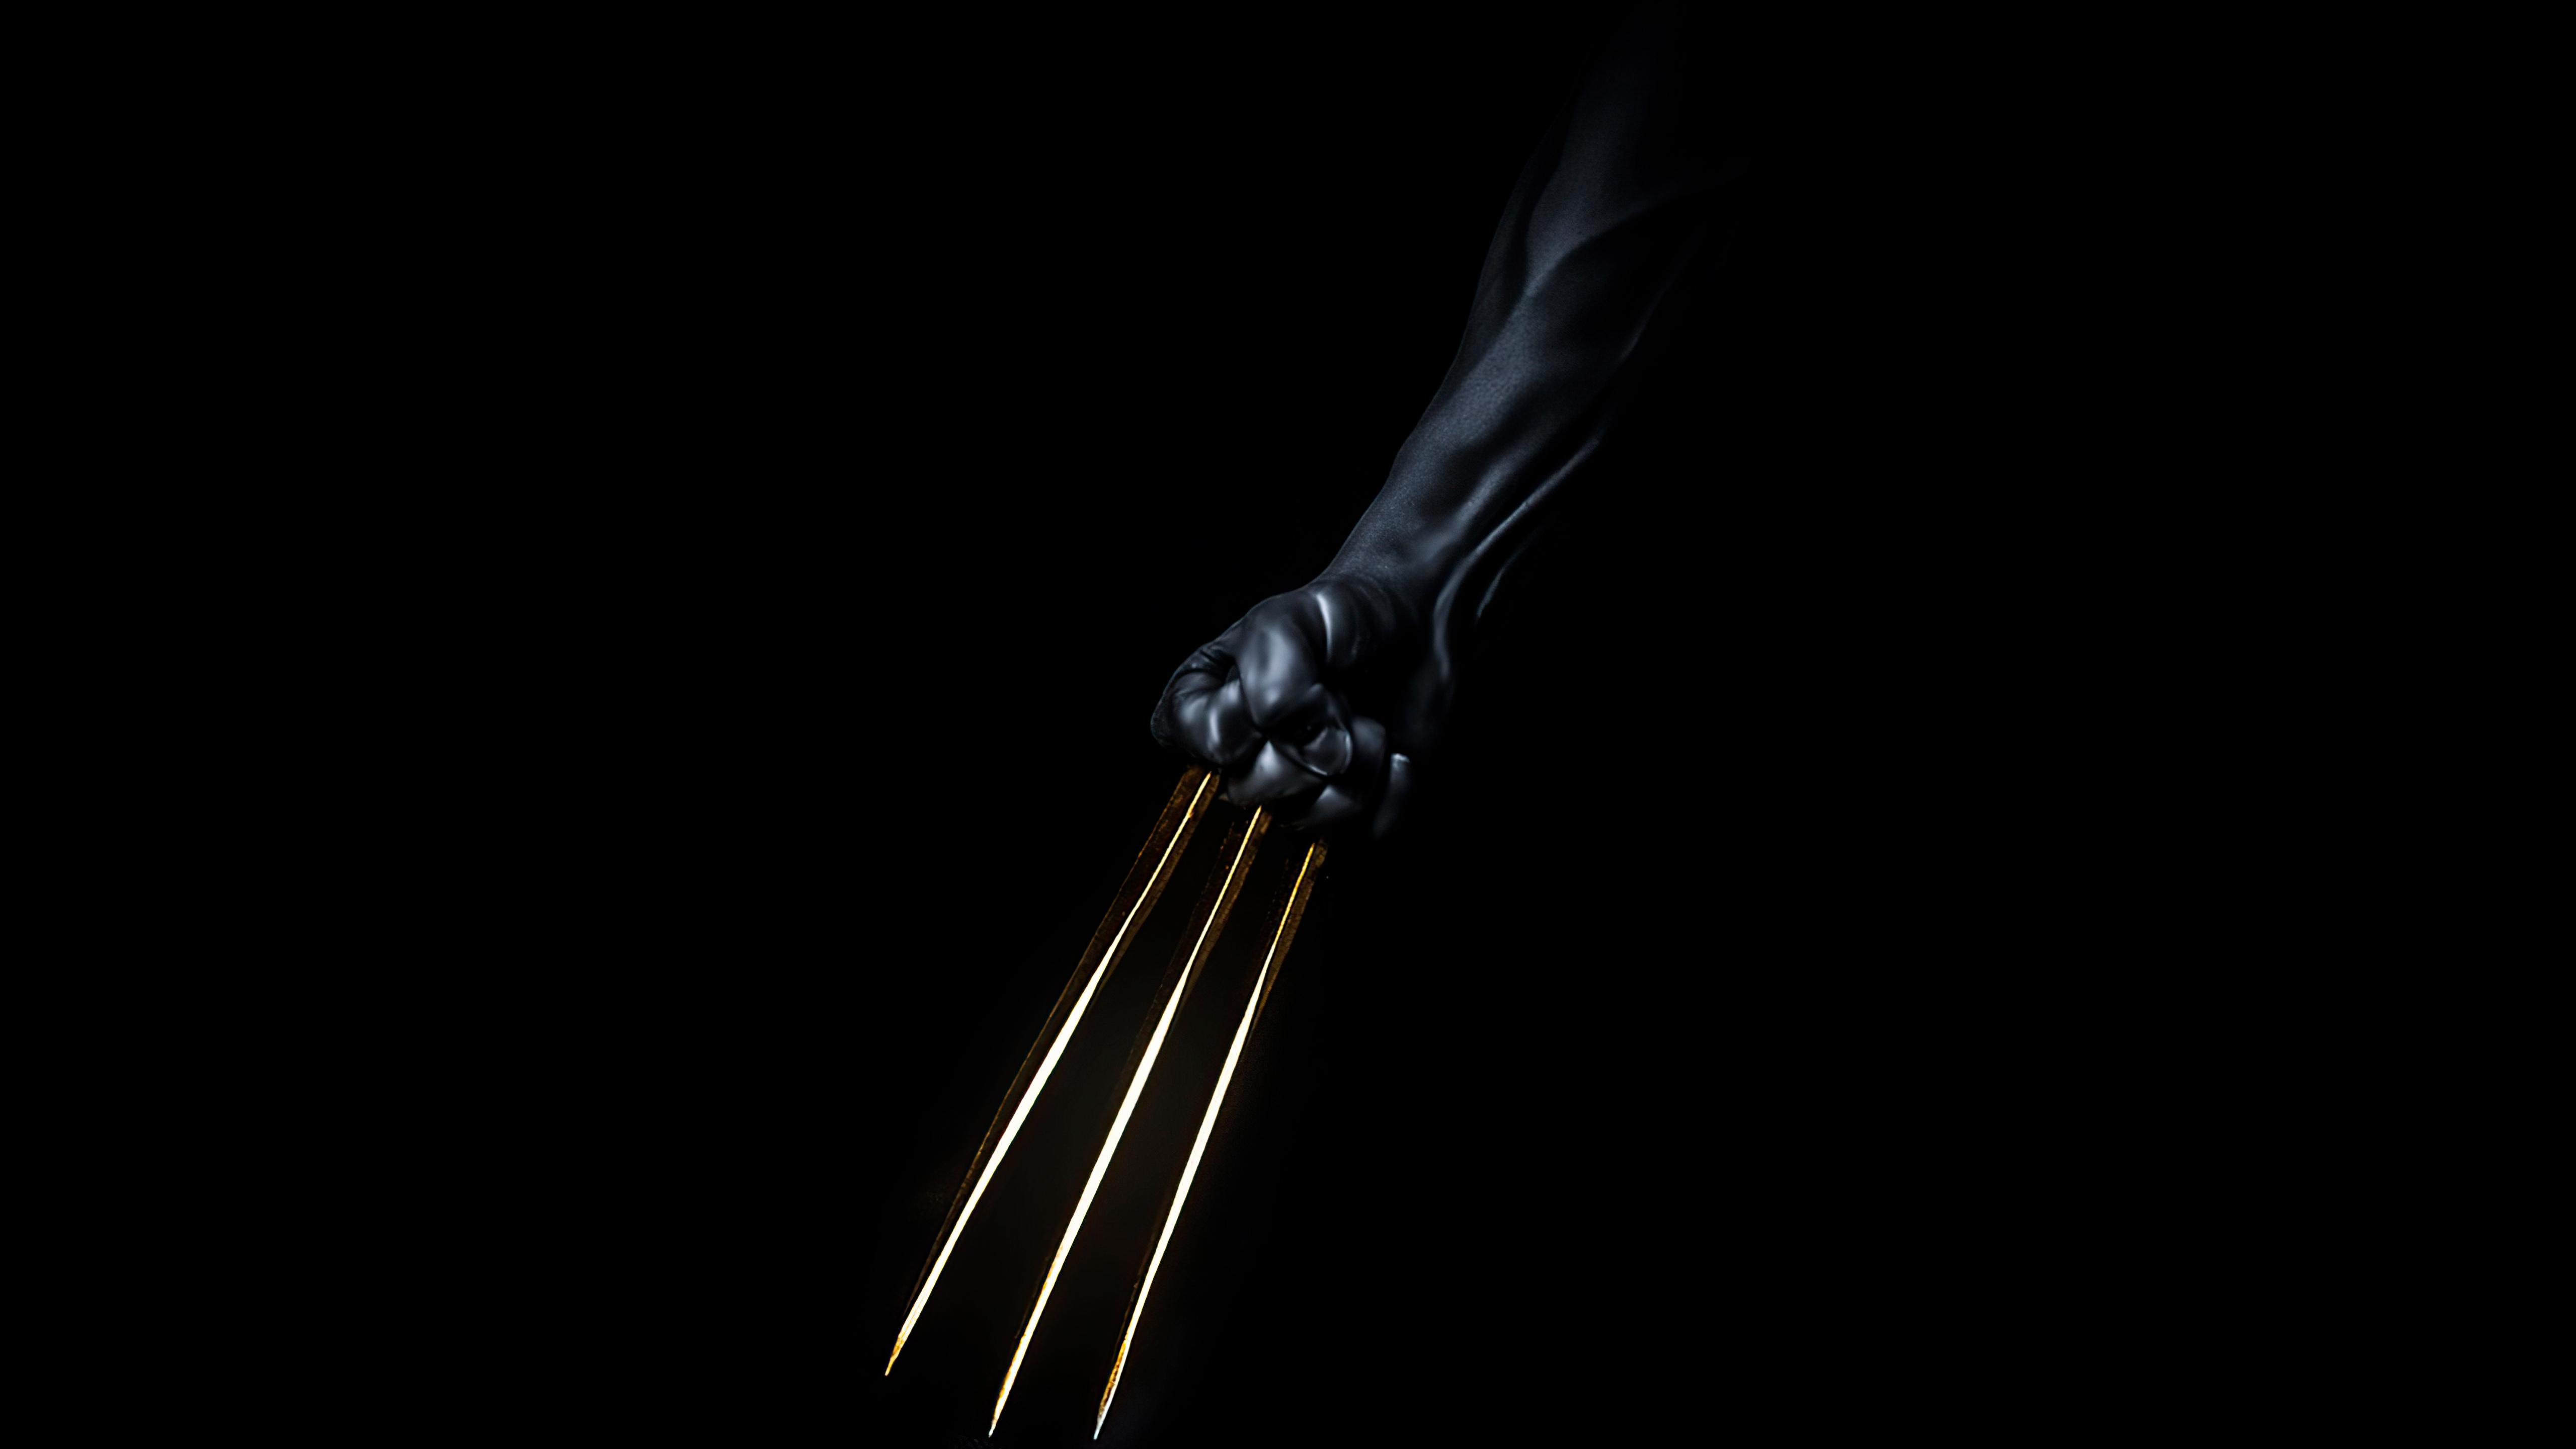 Fondos de pantalla Garras de Wolverine doradas